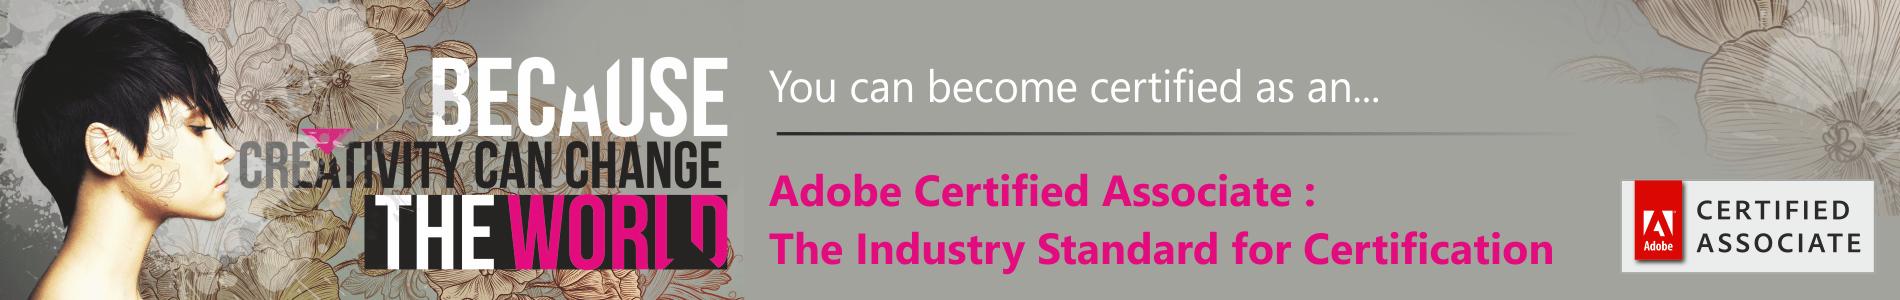 Adobe Certified Associate (ACA) - citis